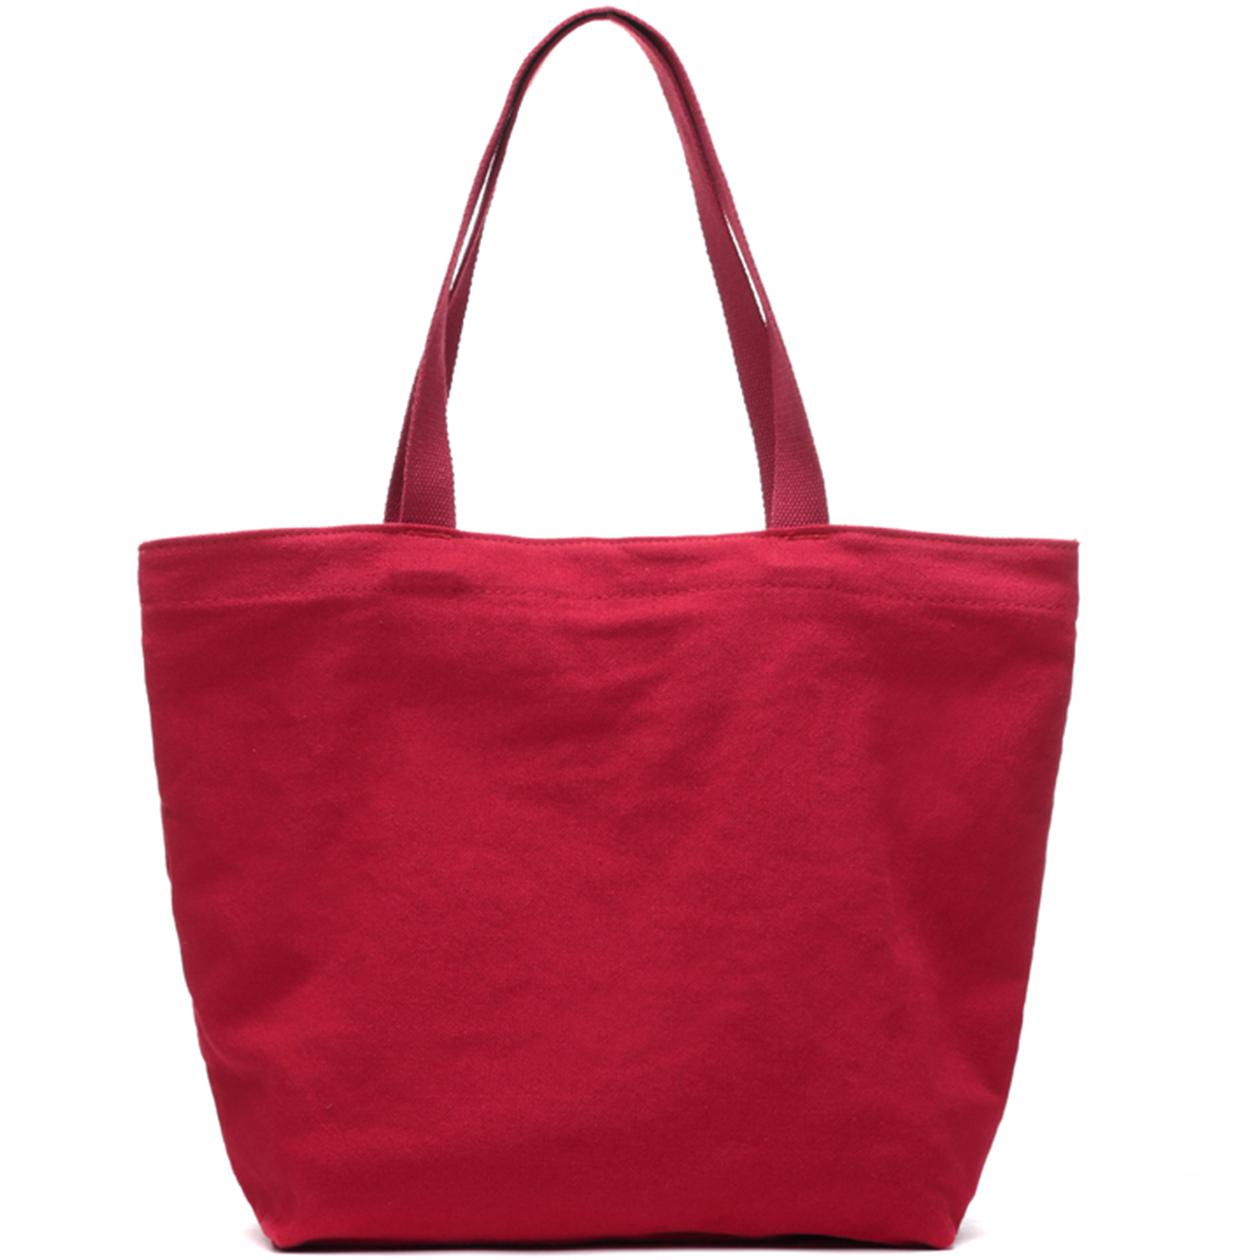 81dd0d98c71f Get Quotations · Yuanben good plant brand new cotton soft popular portable  canvas shoulder bag tote bag leisure female